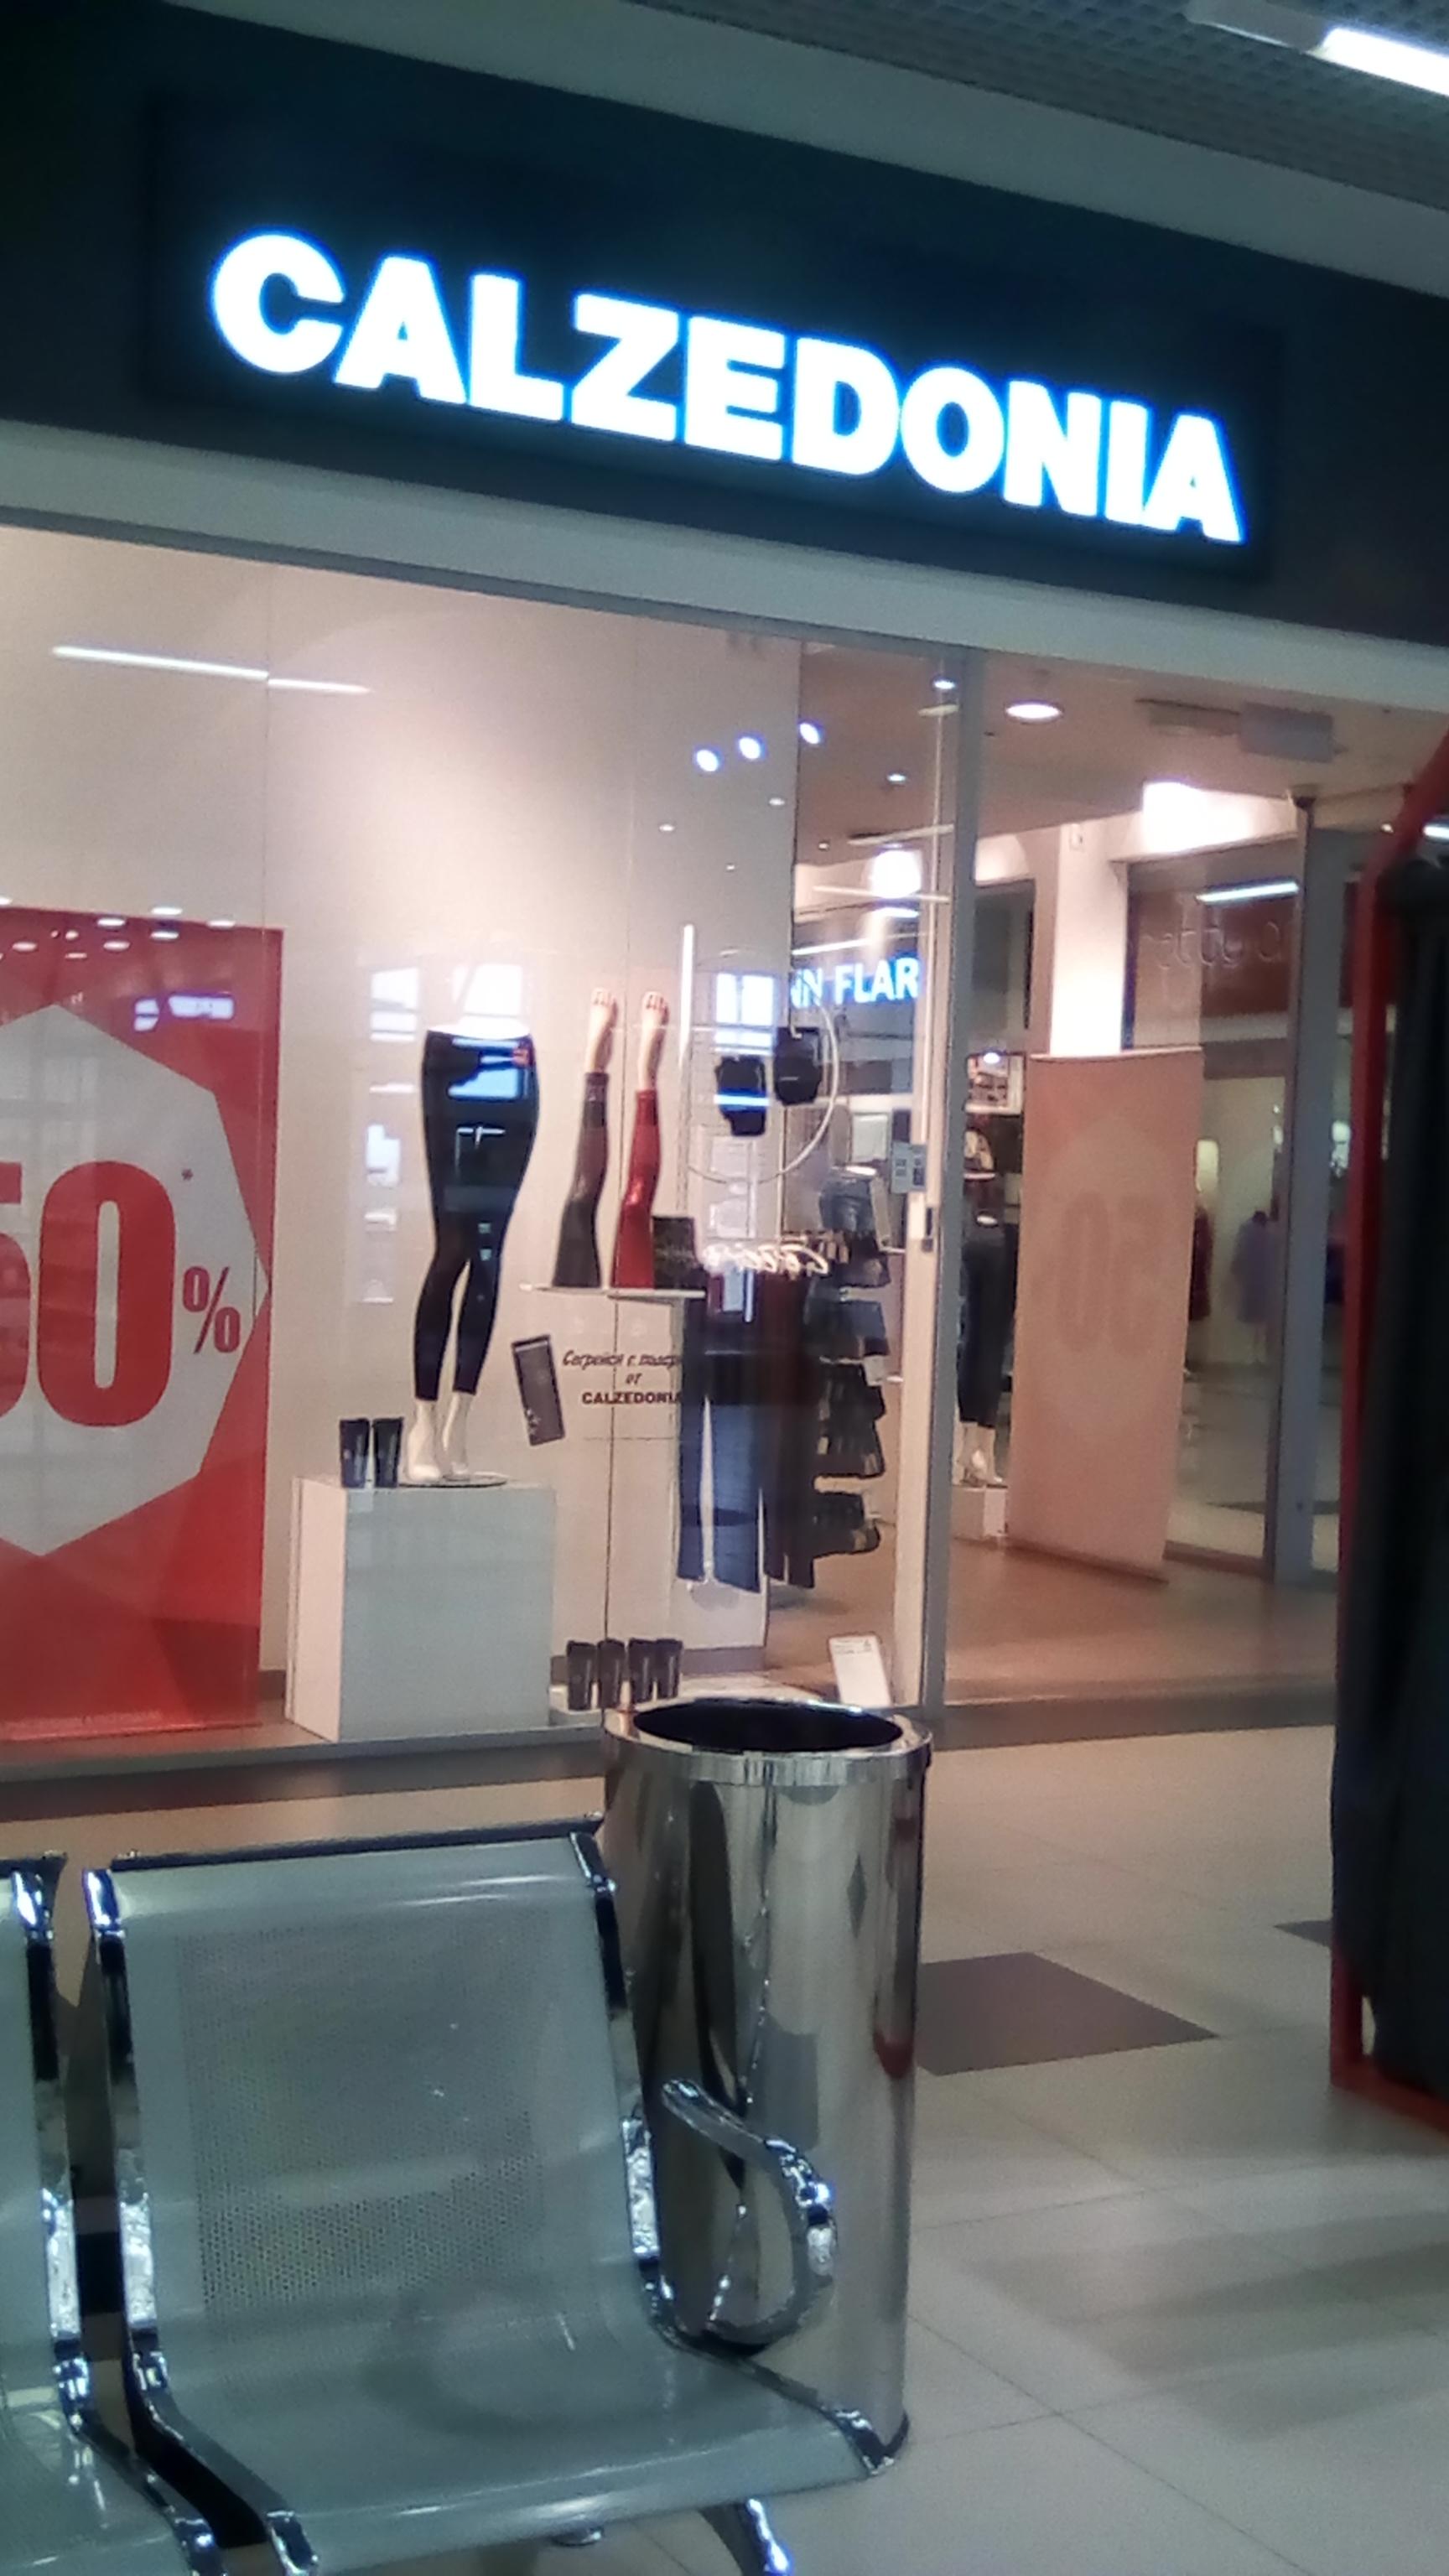 0adc1c3249fcc Calzedonia - магазин чулок и колготок, Саратов — отзывы и фото —  Яндекс.Карты